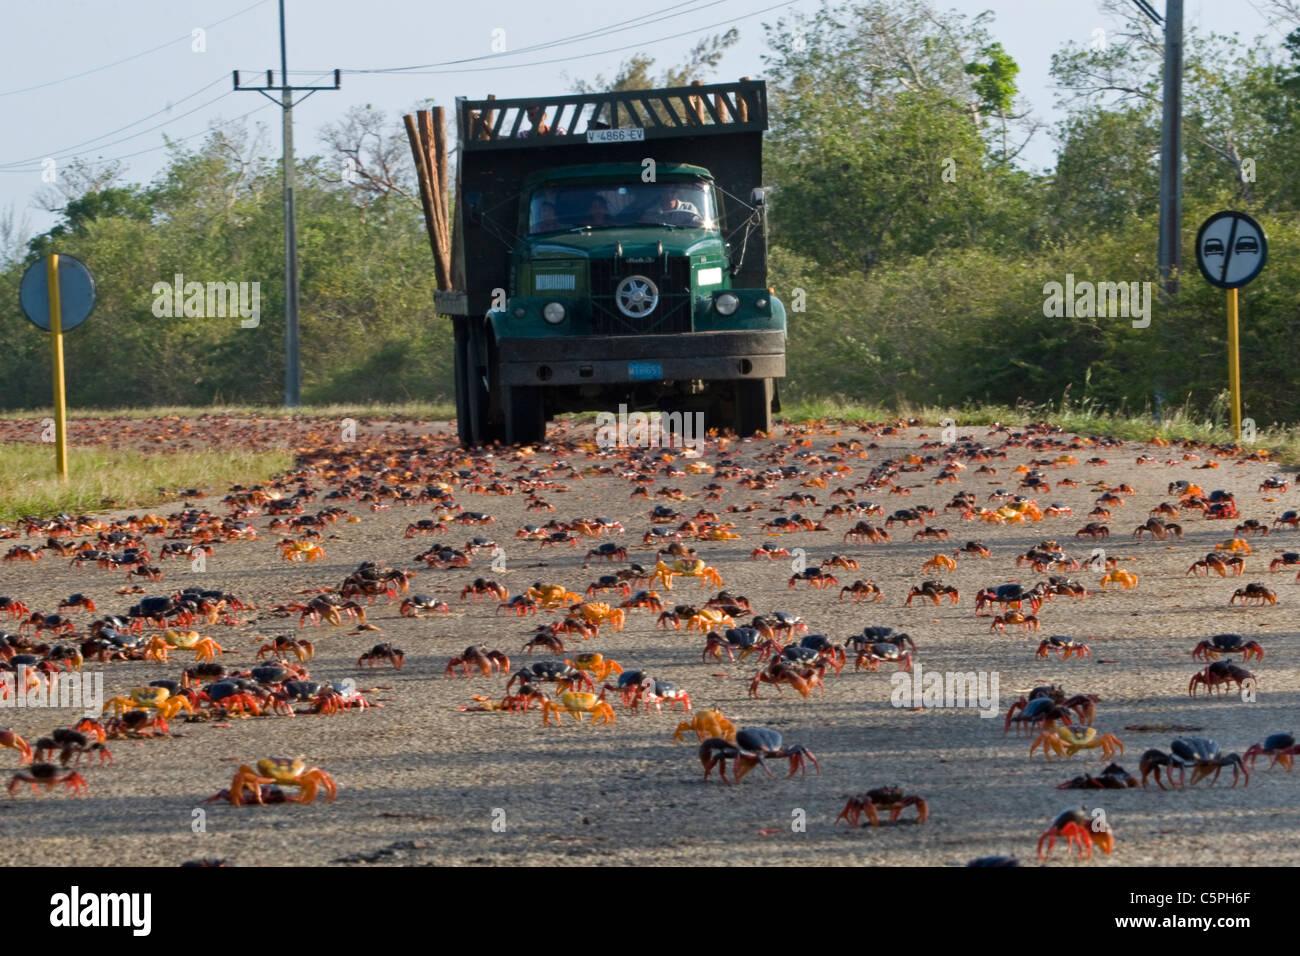 Black Land crabs, Gecarcinus ruricola, migration on the road Playa Girn, Bay of Pigs, Cuba - Stock Image